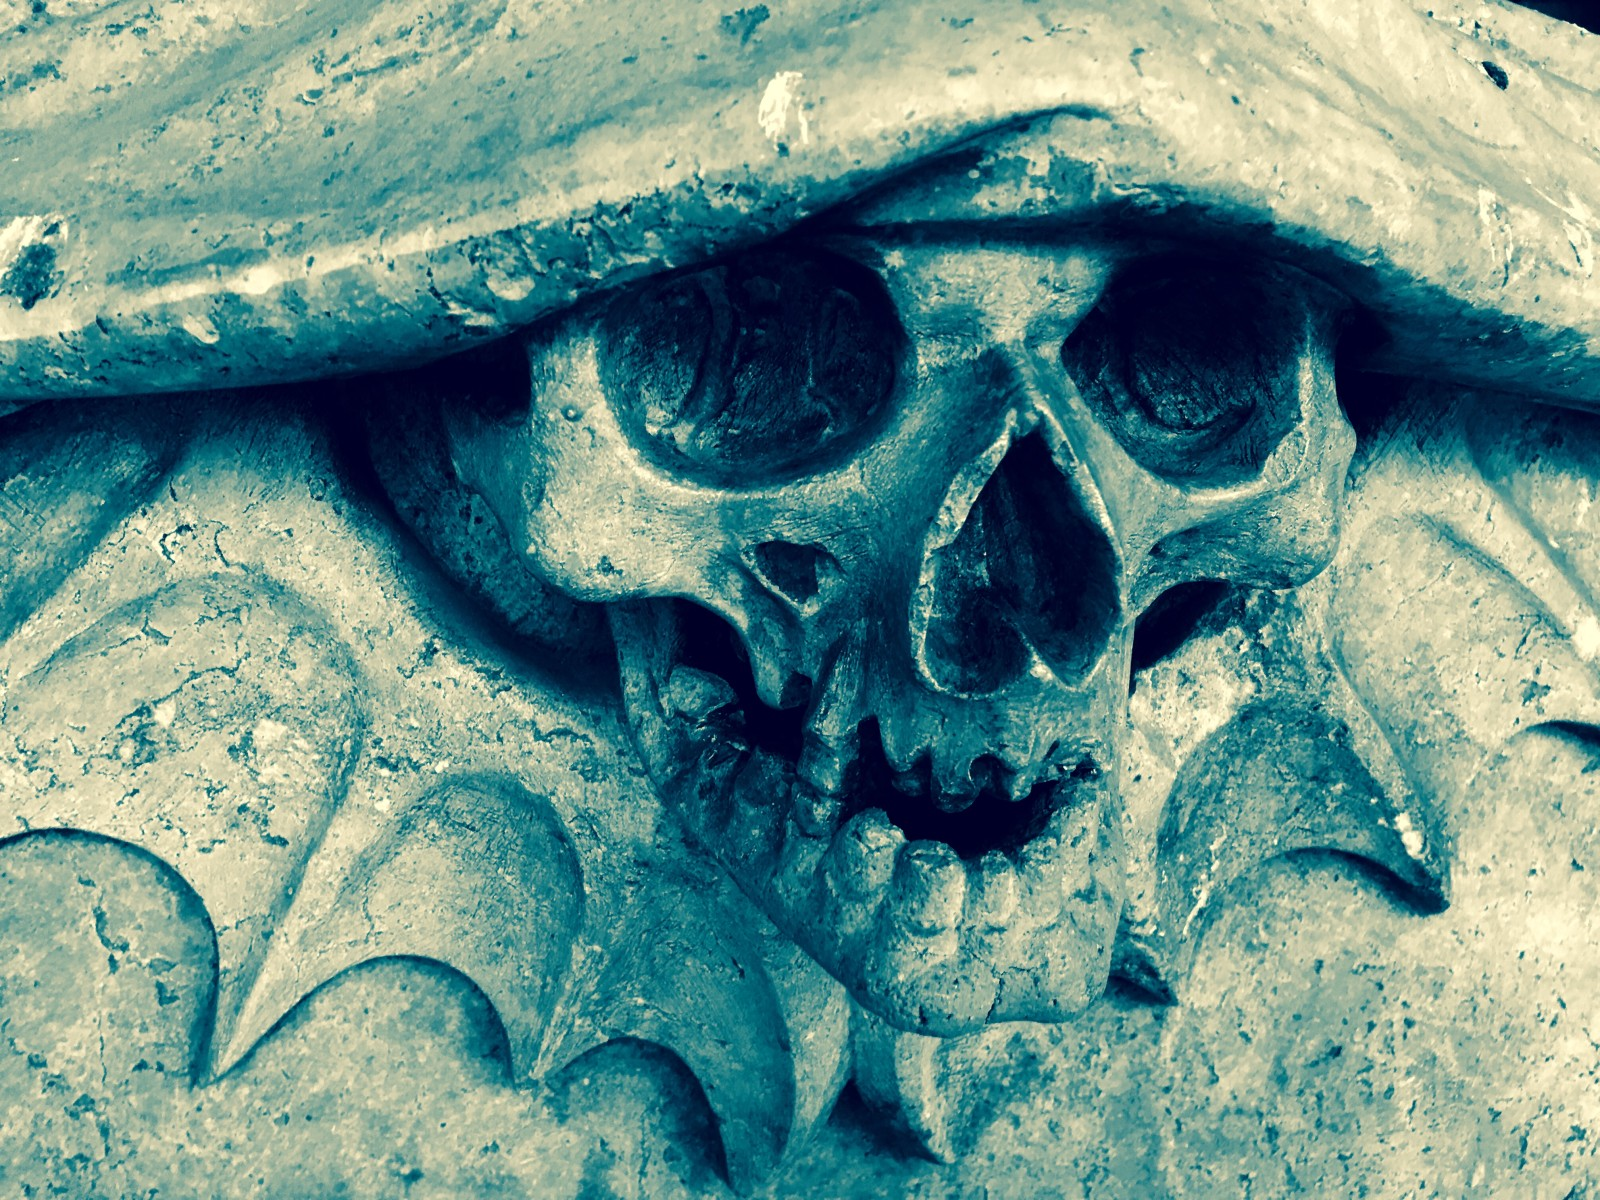 Gruselige Fratzen findet man am Friedhof St. Sebastian an jeder Ecke